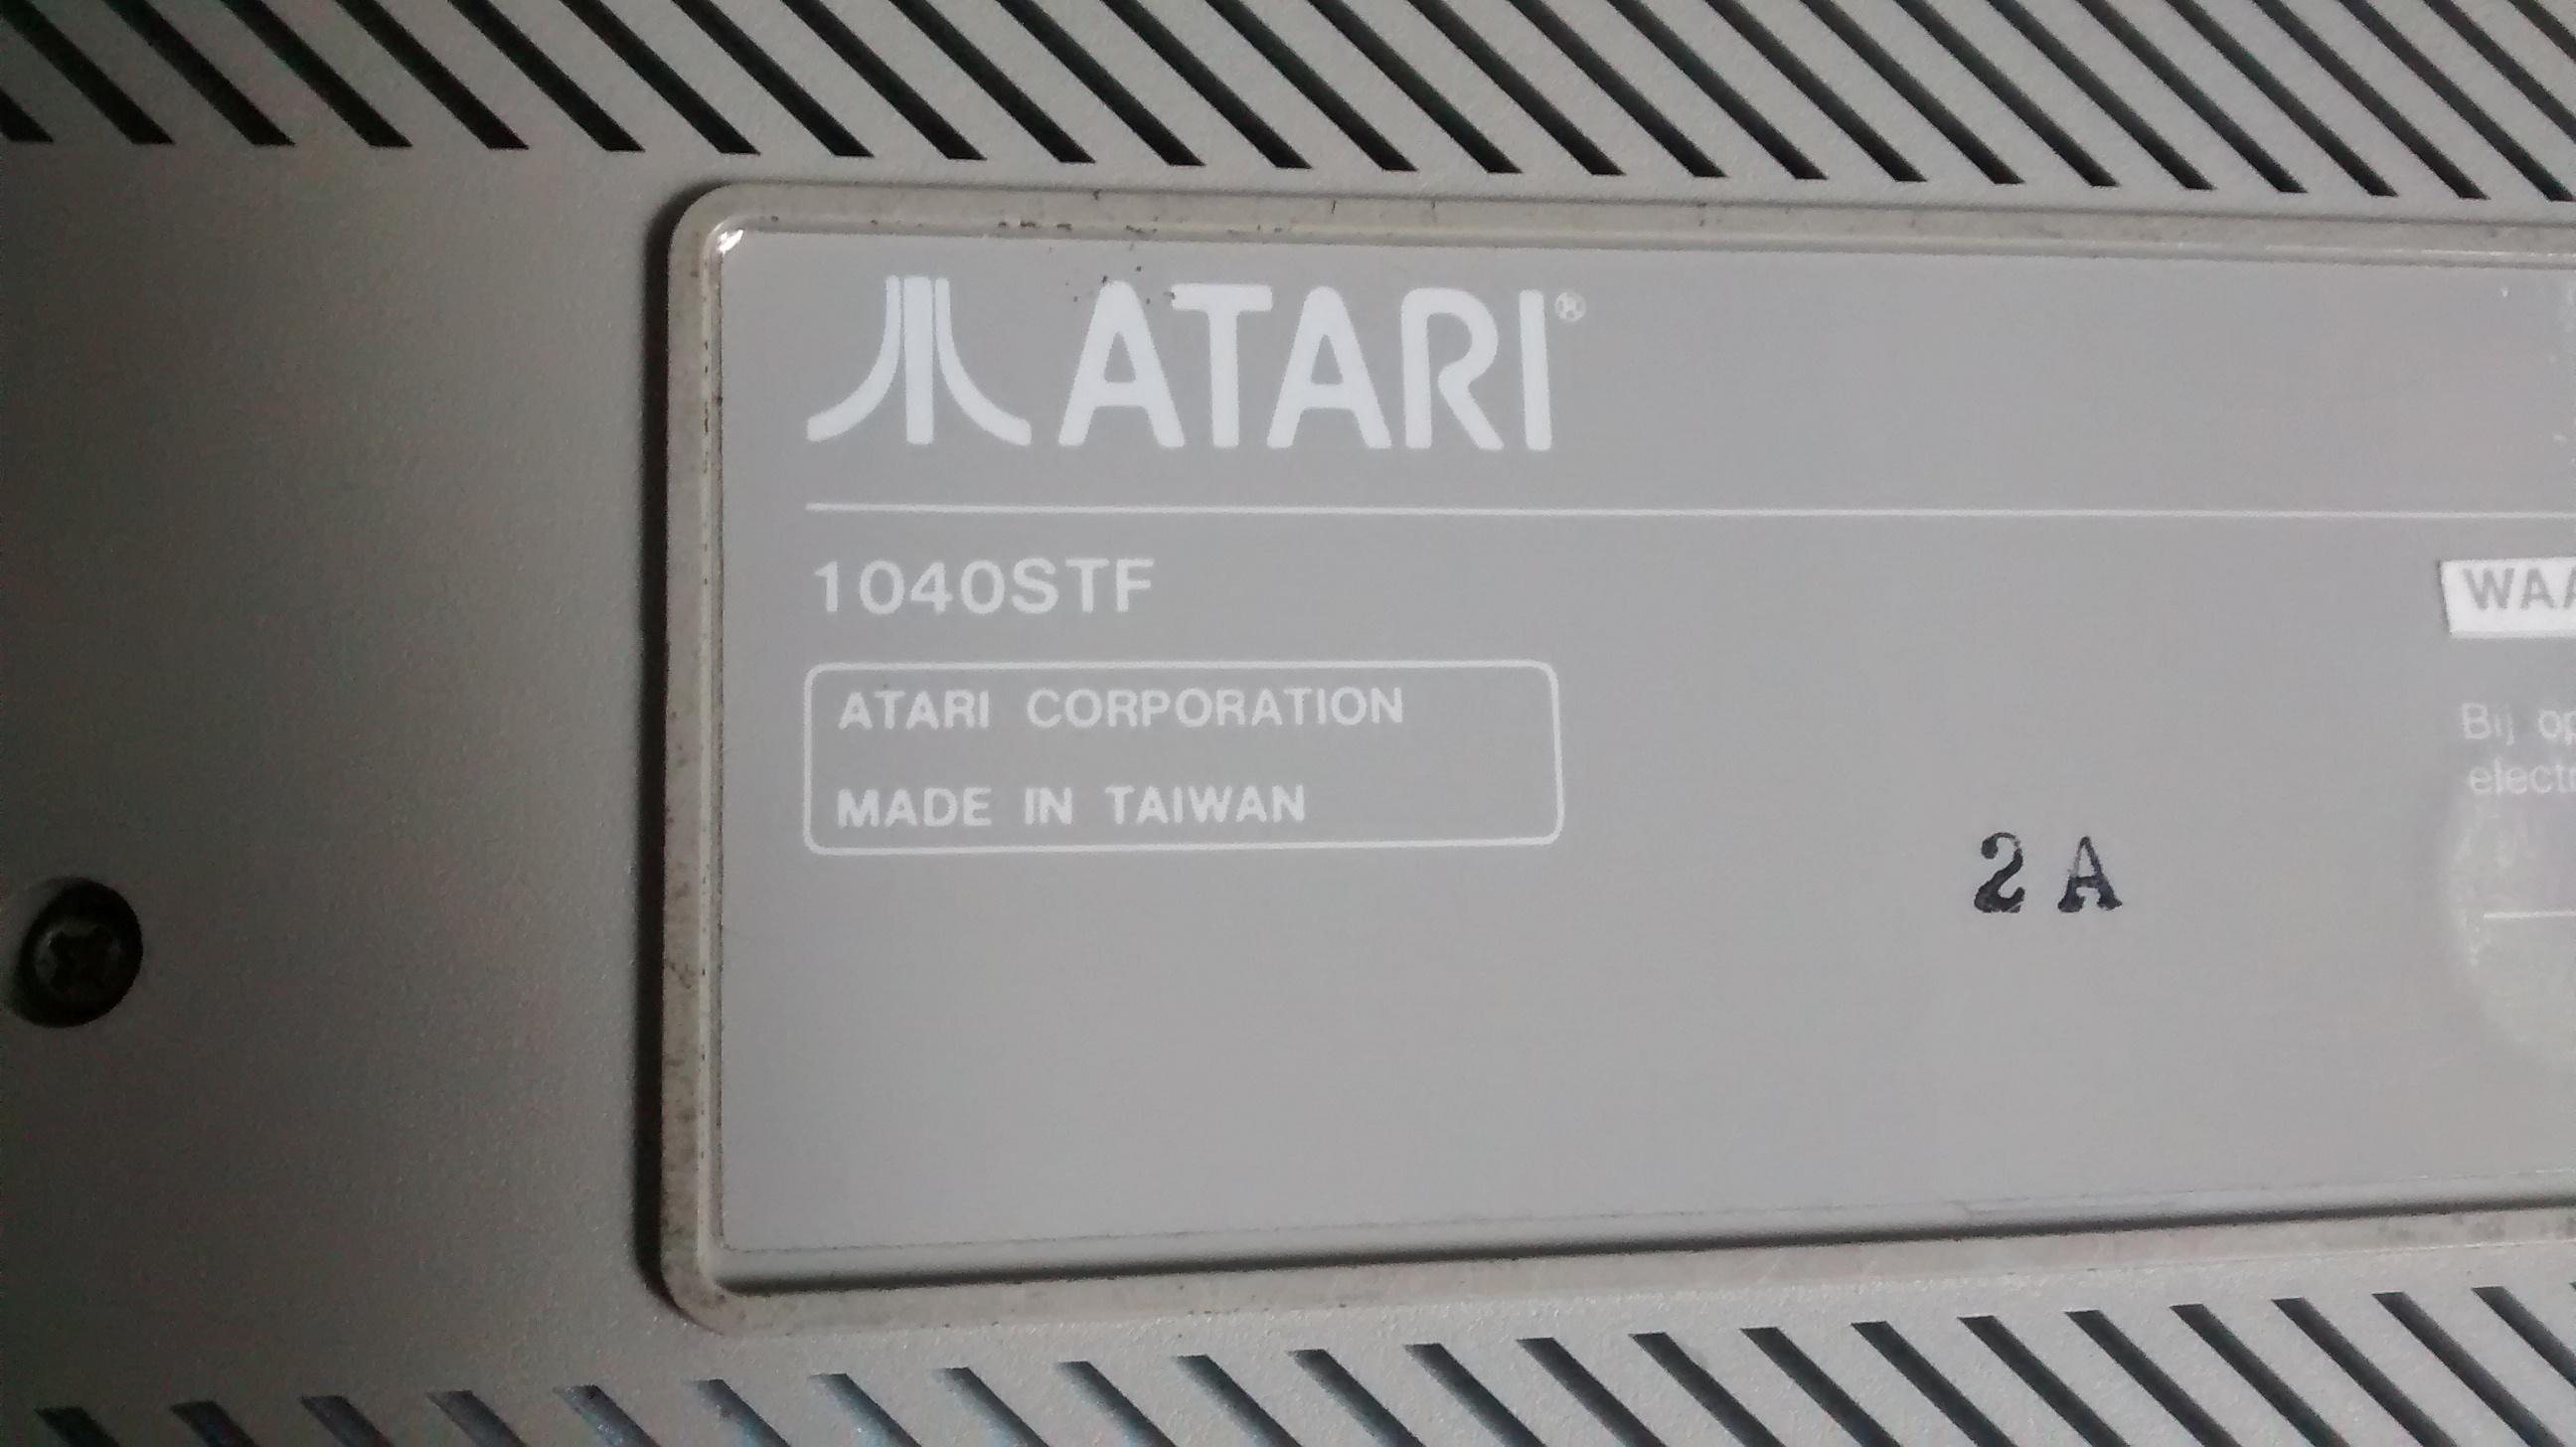 High Resolution Wallpaper | Atari 1040ST 2592x1456 px